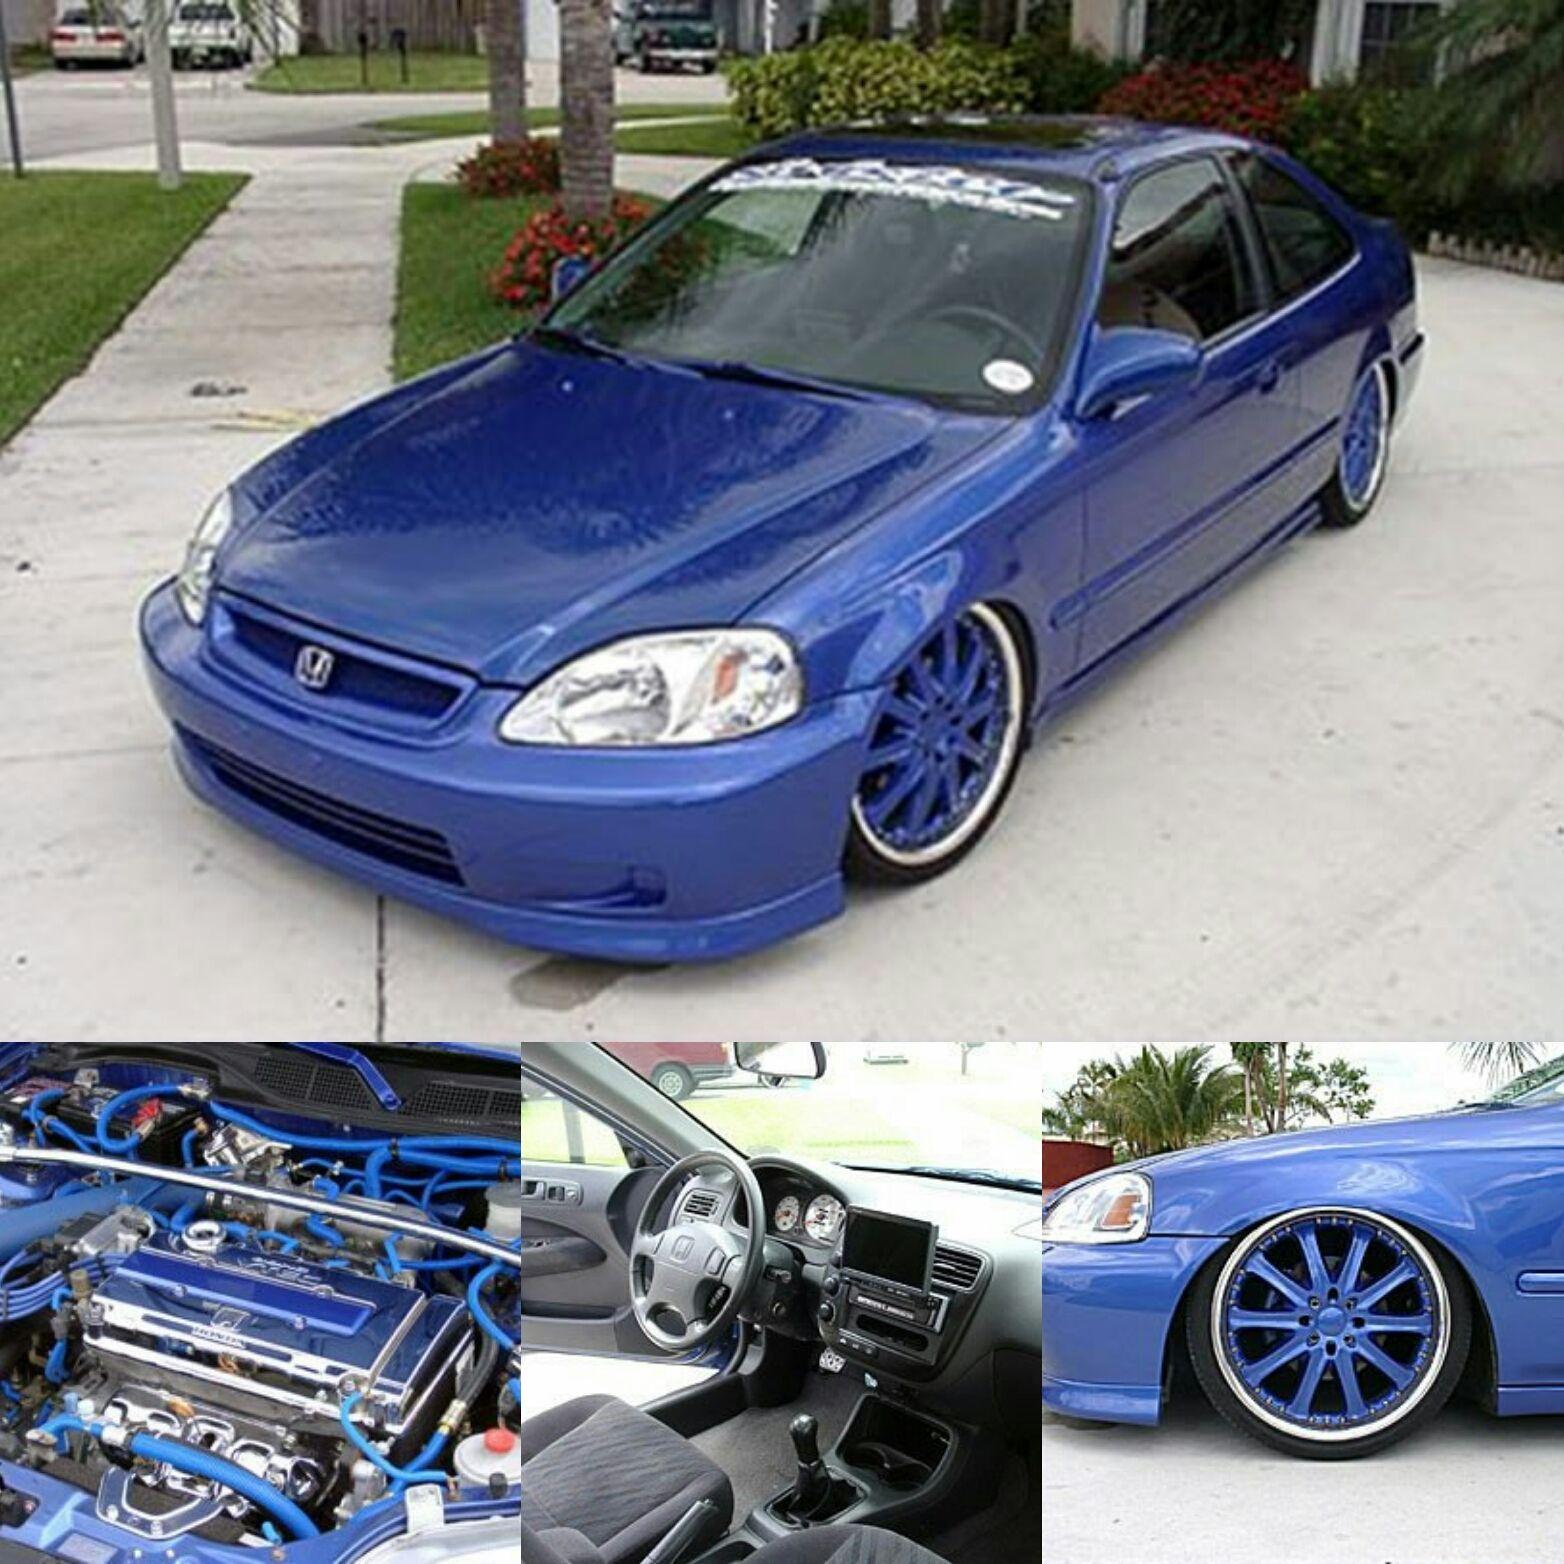 Flsfurious S 1999 Honda Civic Si Coupe Honda Civic Si Coupe 1999 Honda Civic Honda Civic